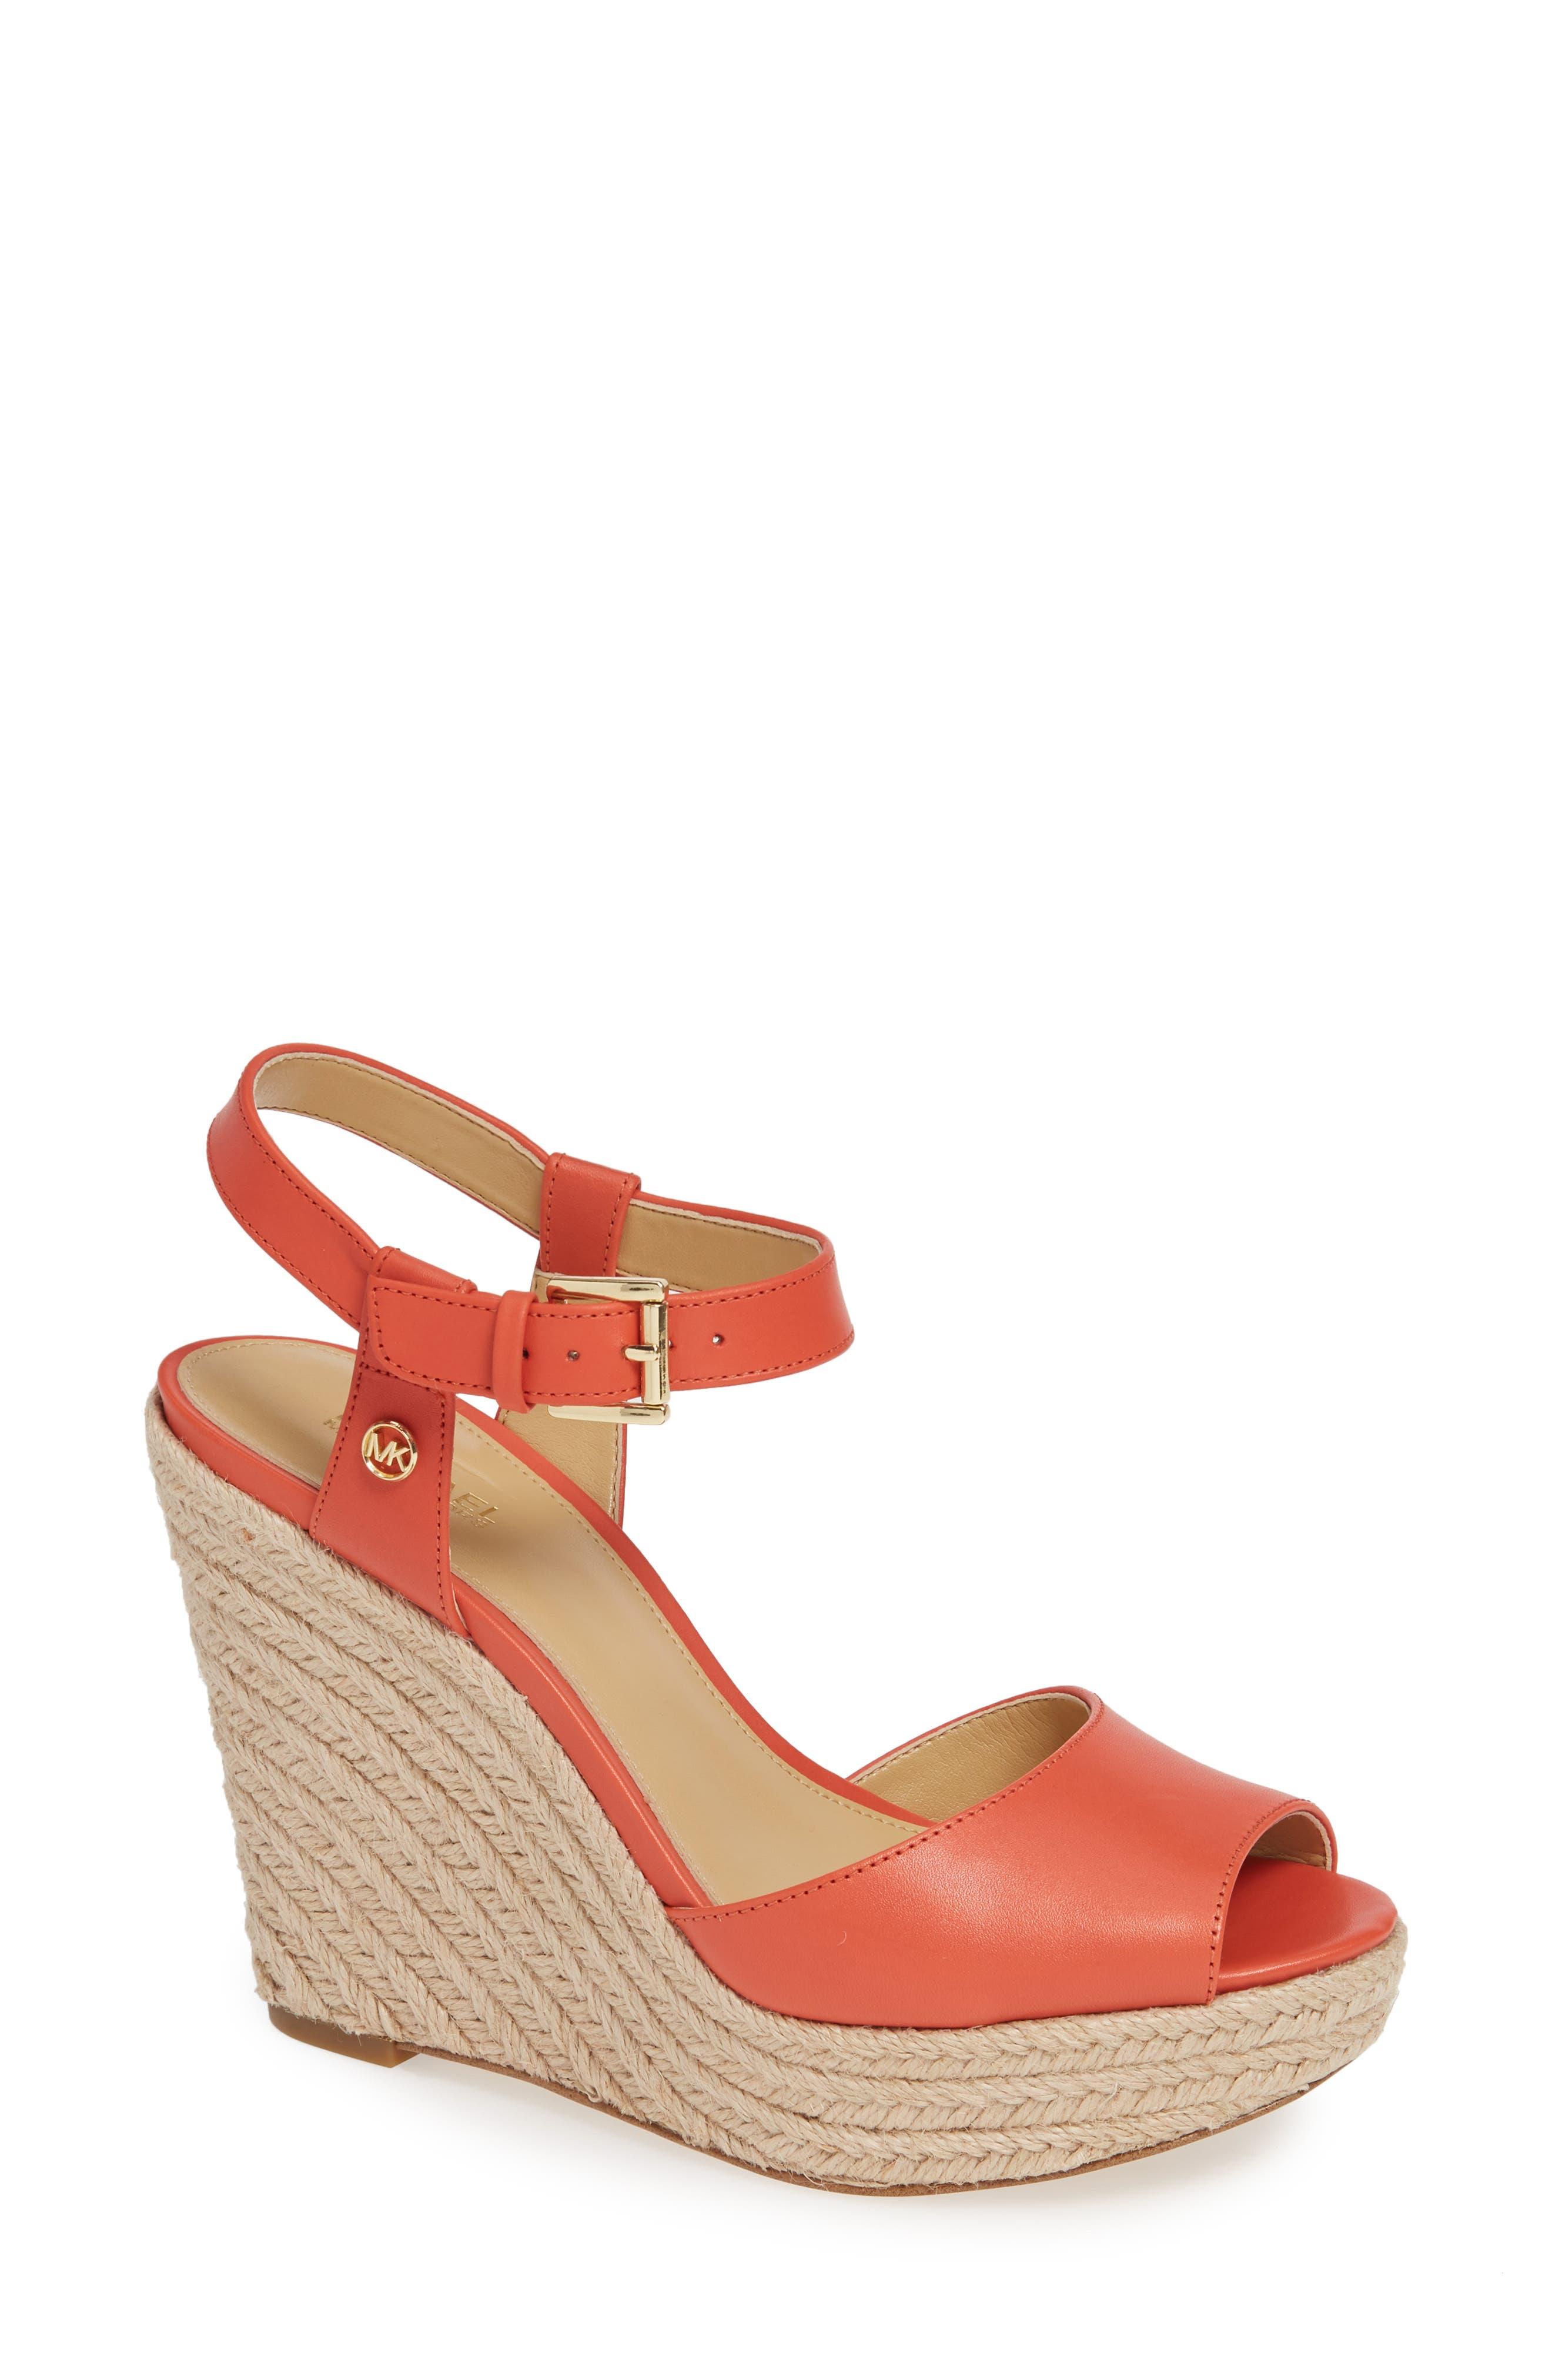 Carlyn Espadrille Wedge Sandal, Main, color, TERRACOTTA VACHETTA LEATHER